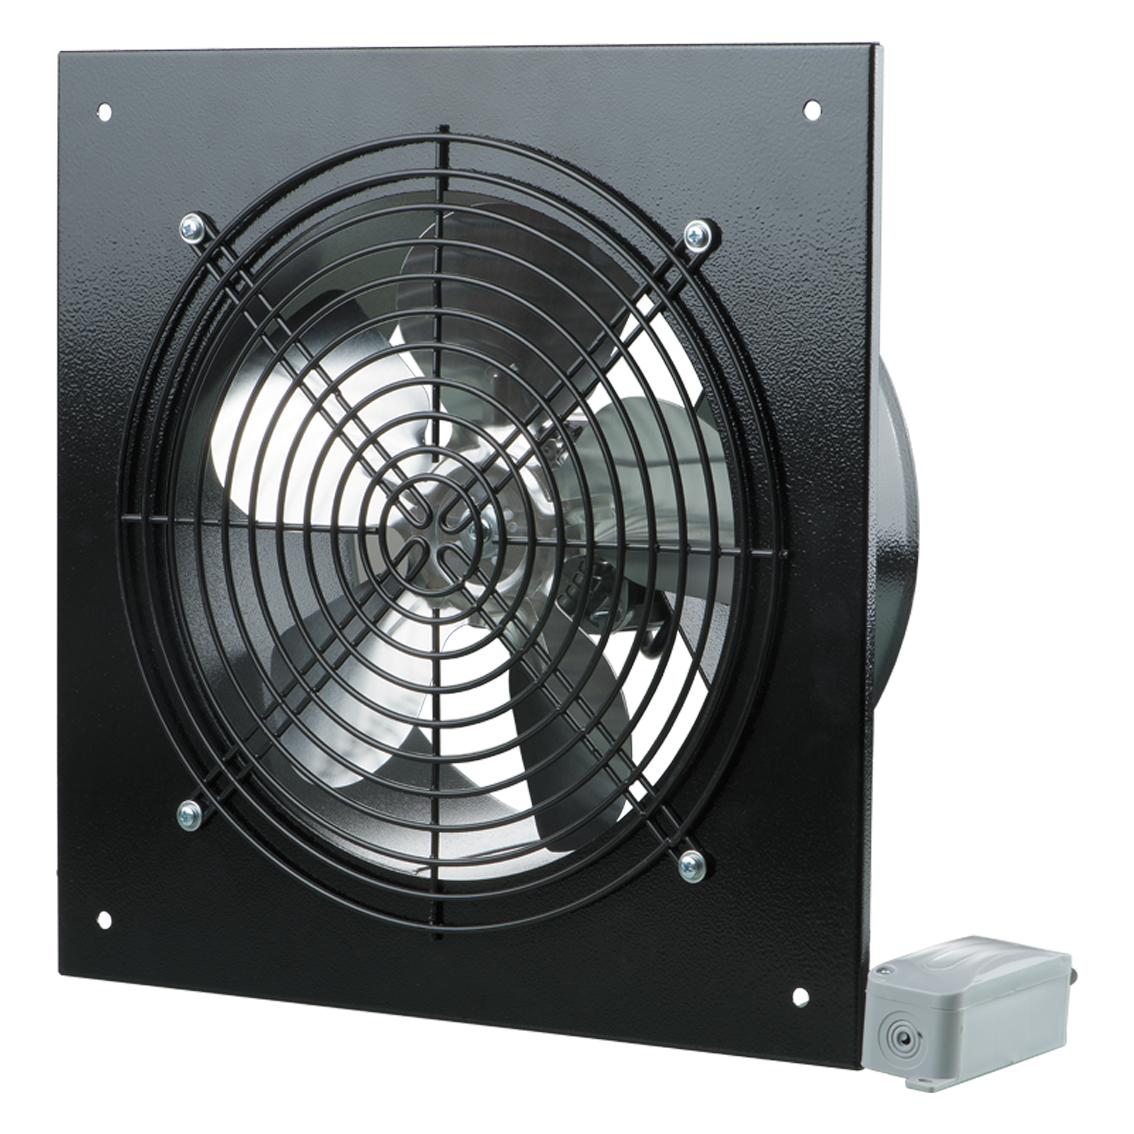 Ventilator aksijalni OV1 315 Vents Elektro Vukojevic